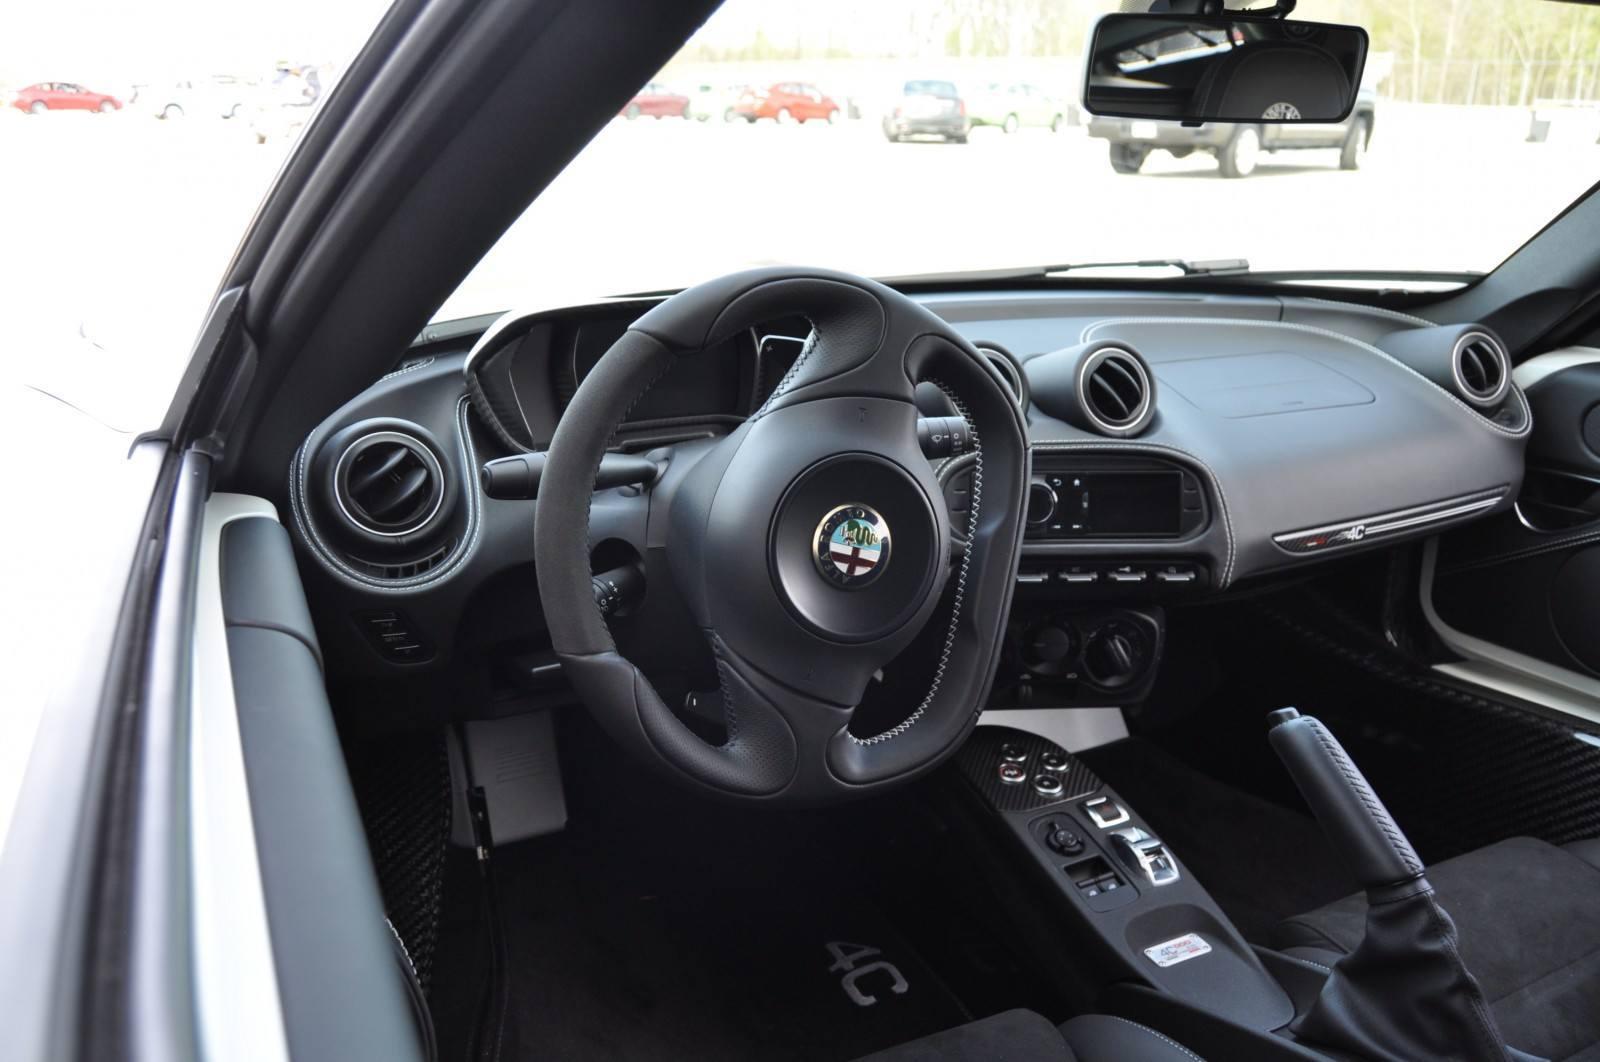 Gorgeous 2015 Alfa-Romeo 4C Revealed in Full USA Trim + New Headlights! 37